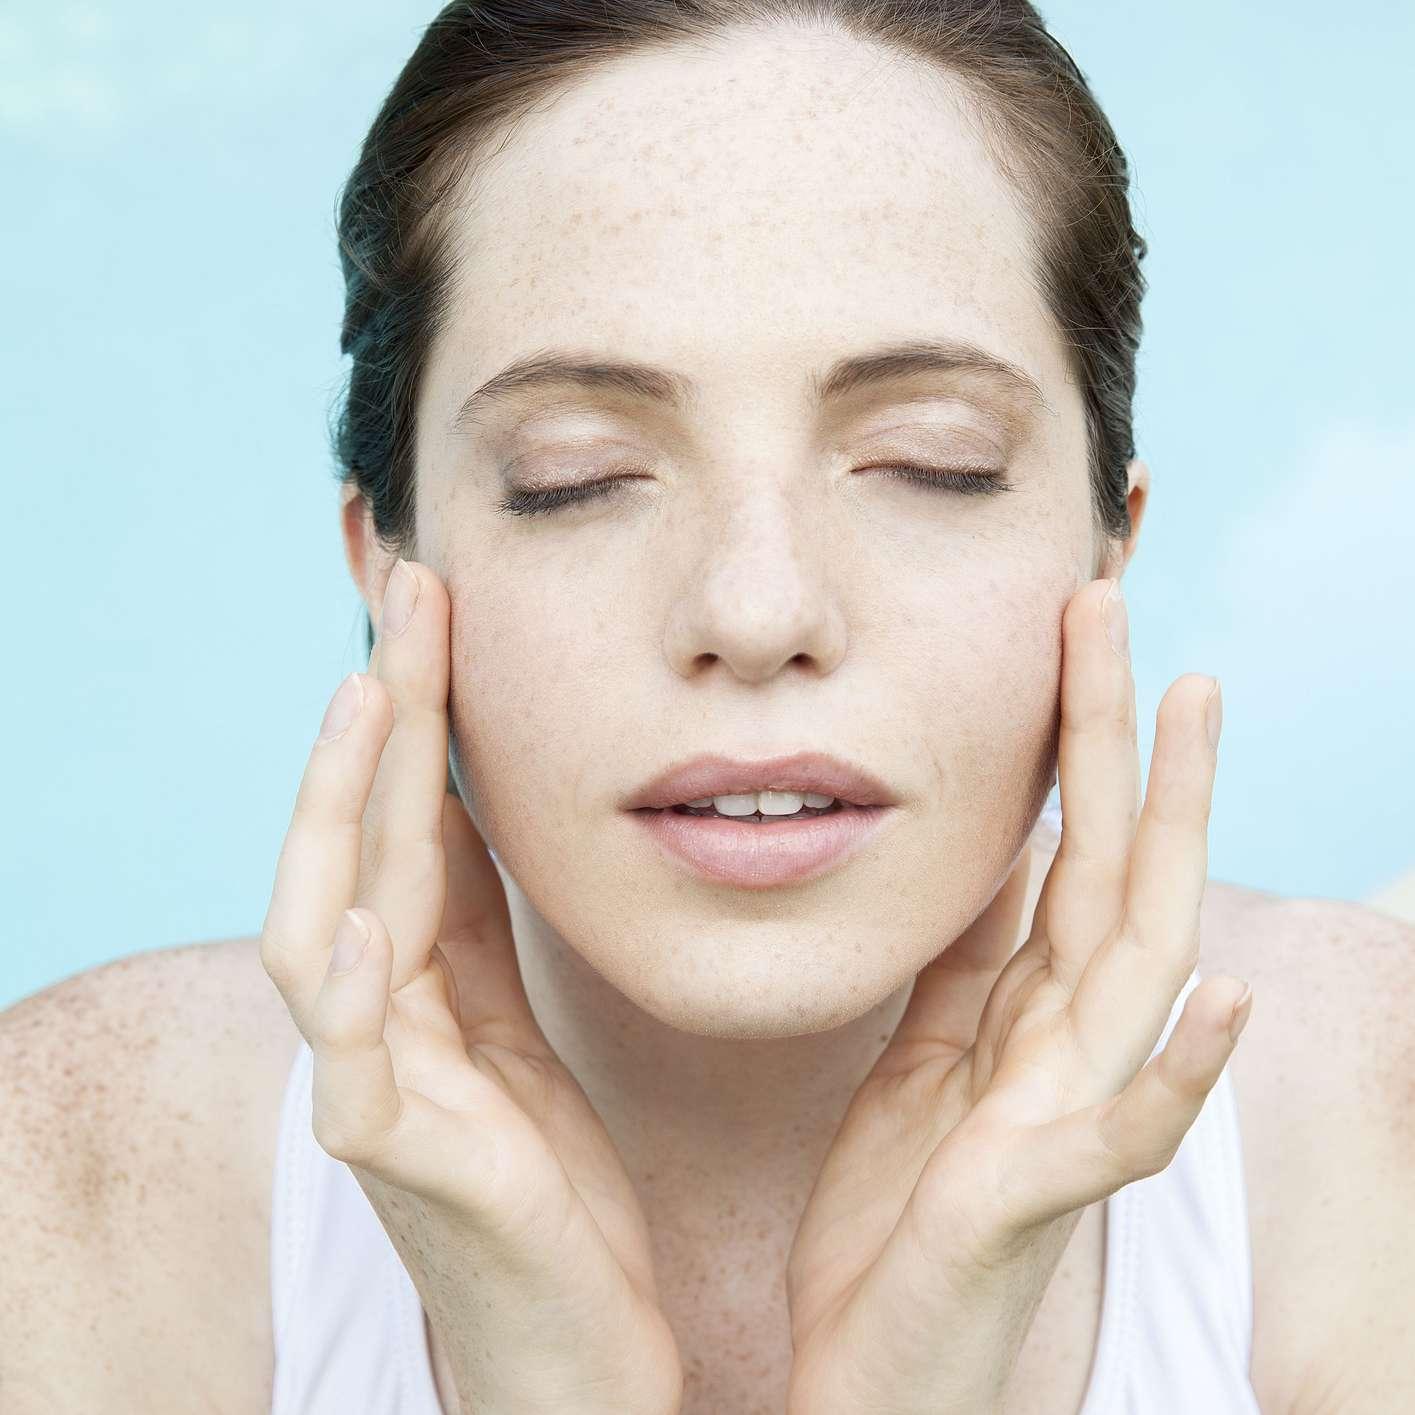 woman massaging/touching face